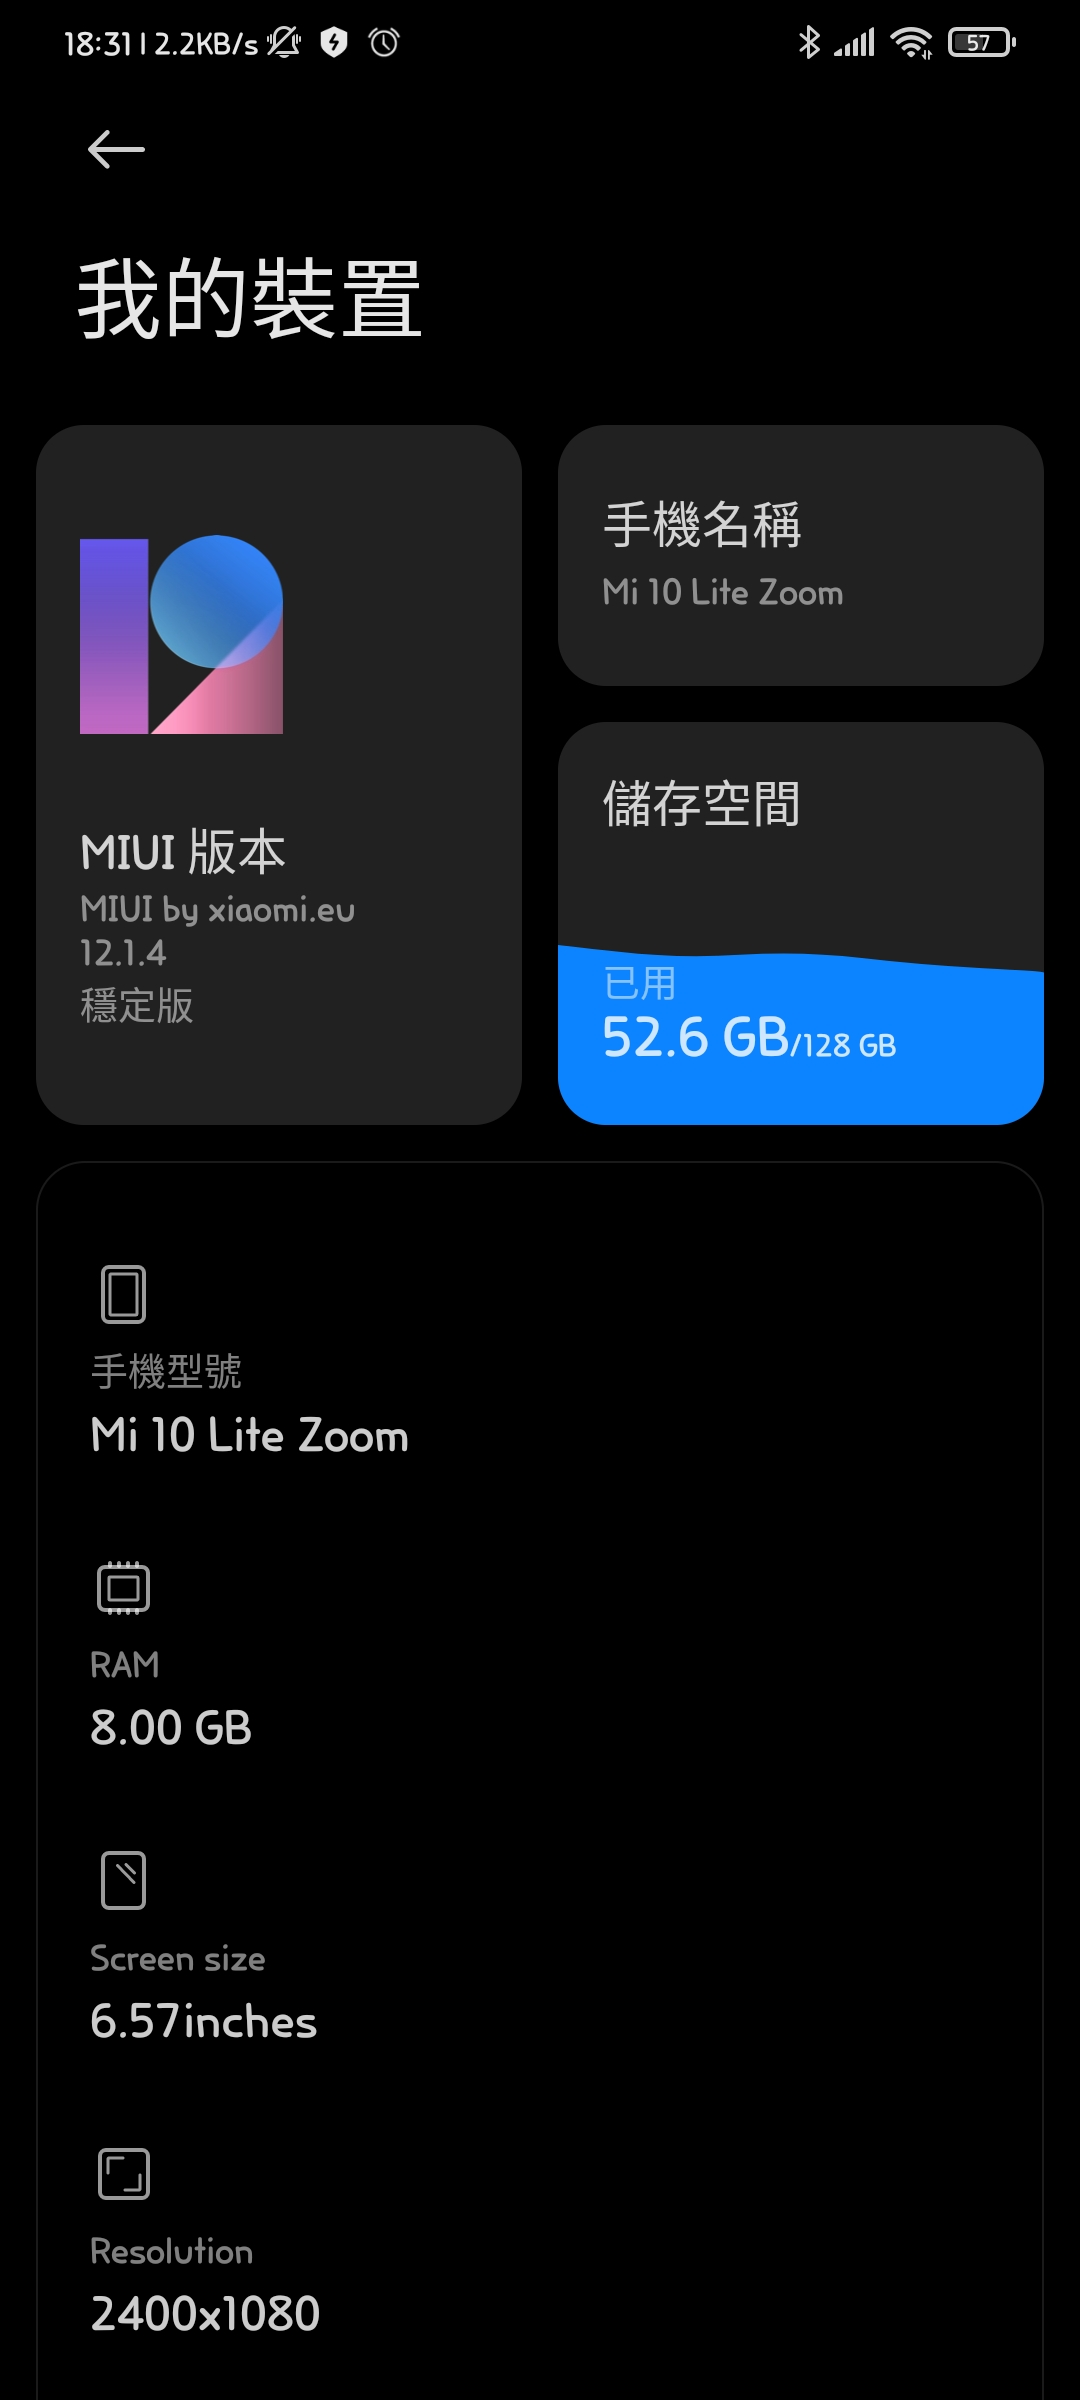 Screenshot_2021-01-20-18-31-47-304_com.android.settings.jpg